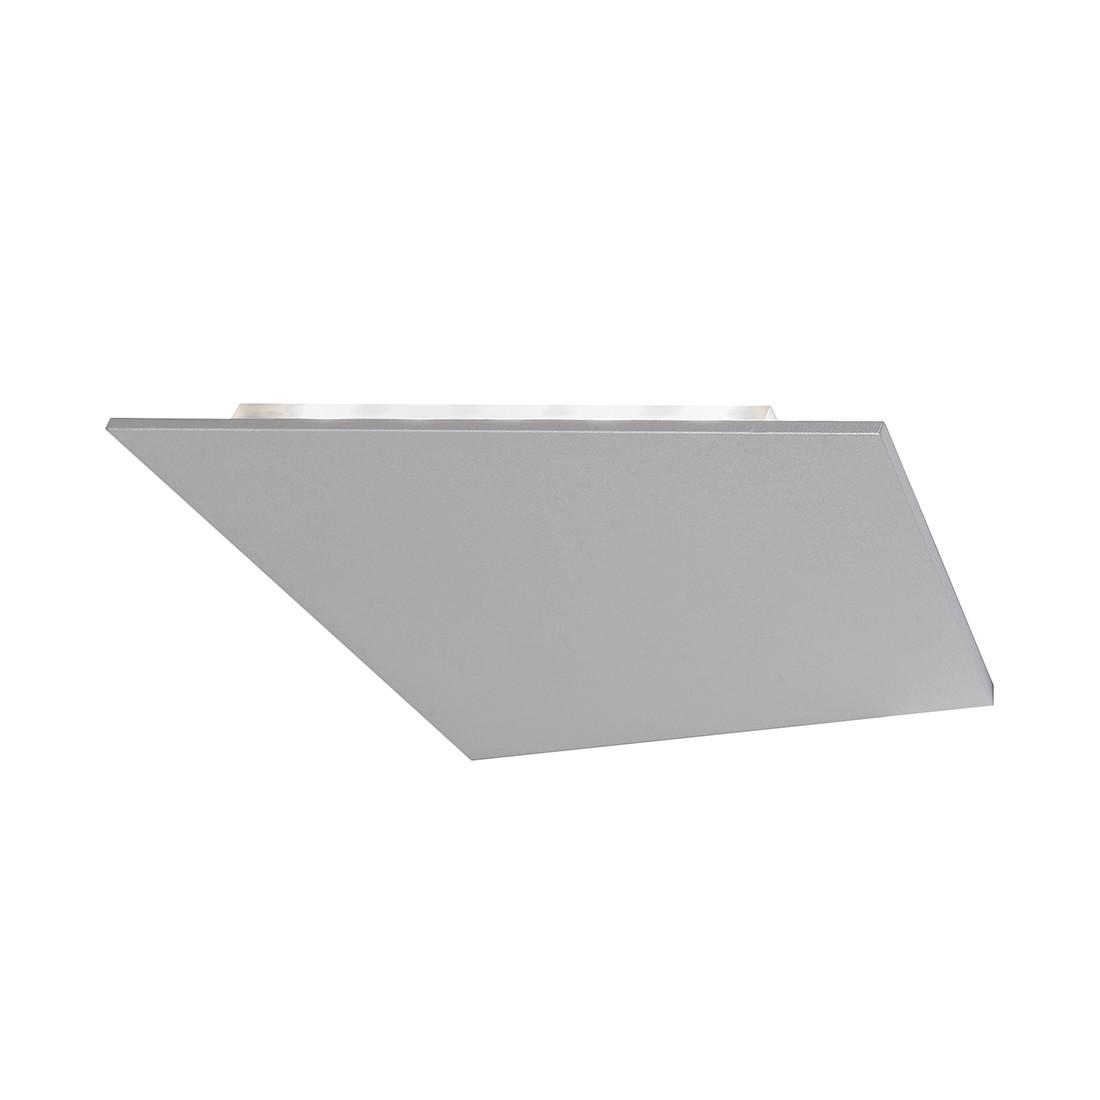 Wandleuchte Nemerow – Aluminium – 1-flammig, FLI Leuchten günstig